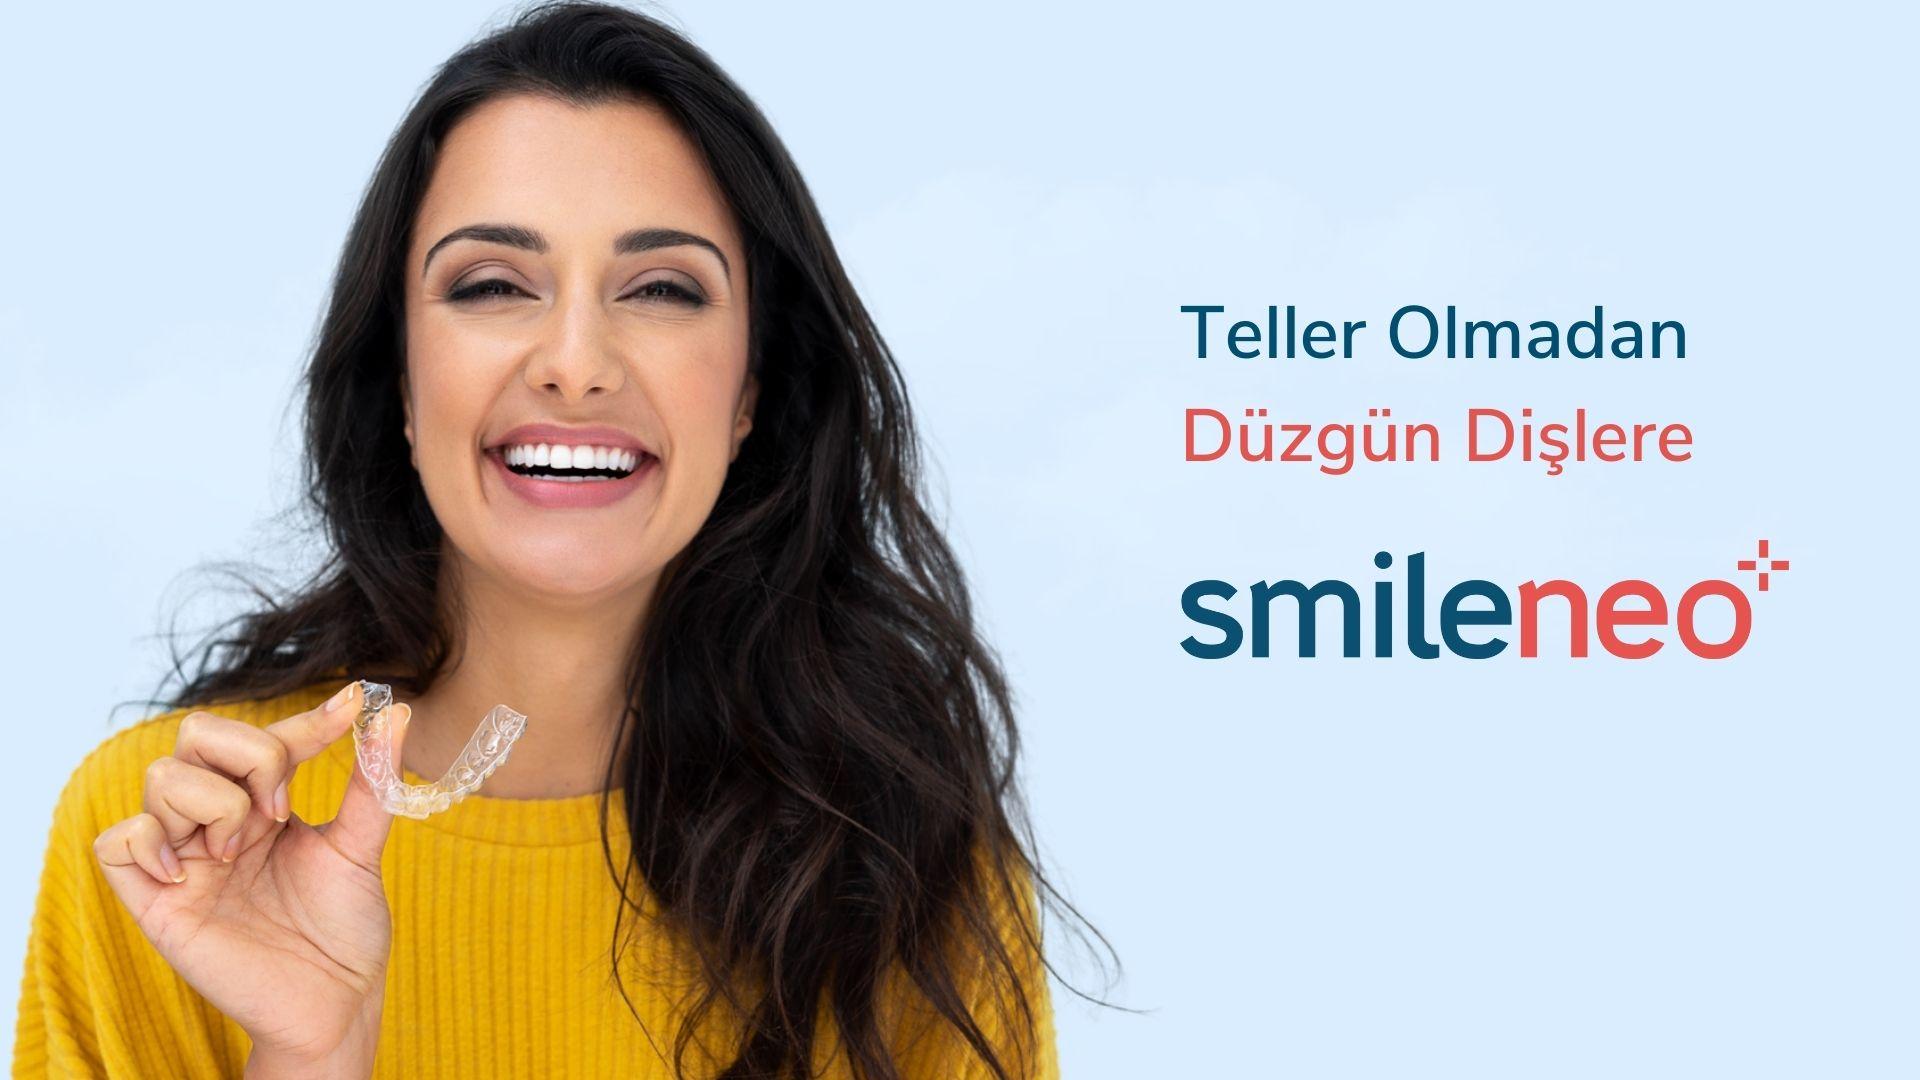 Smiling woman holding aligner